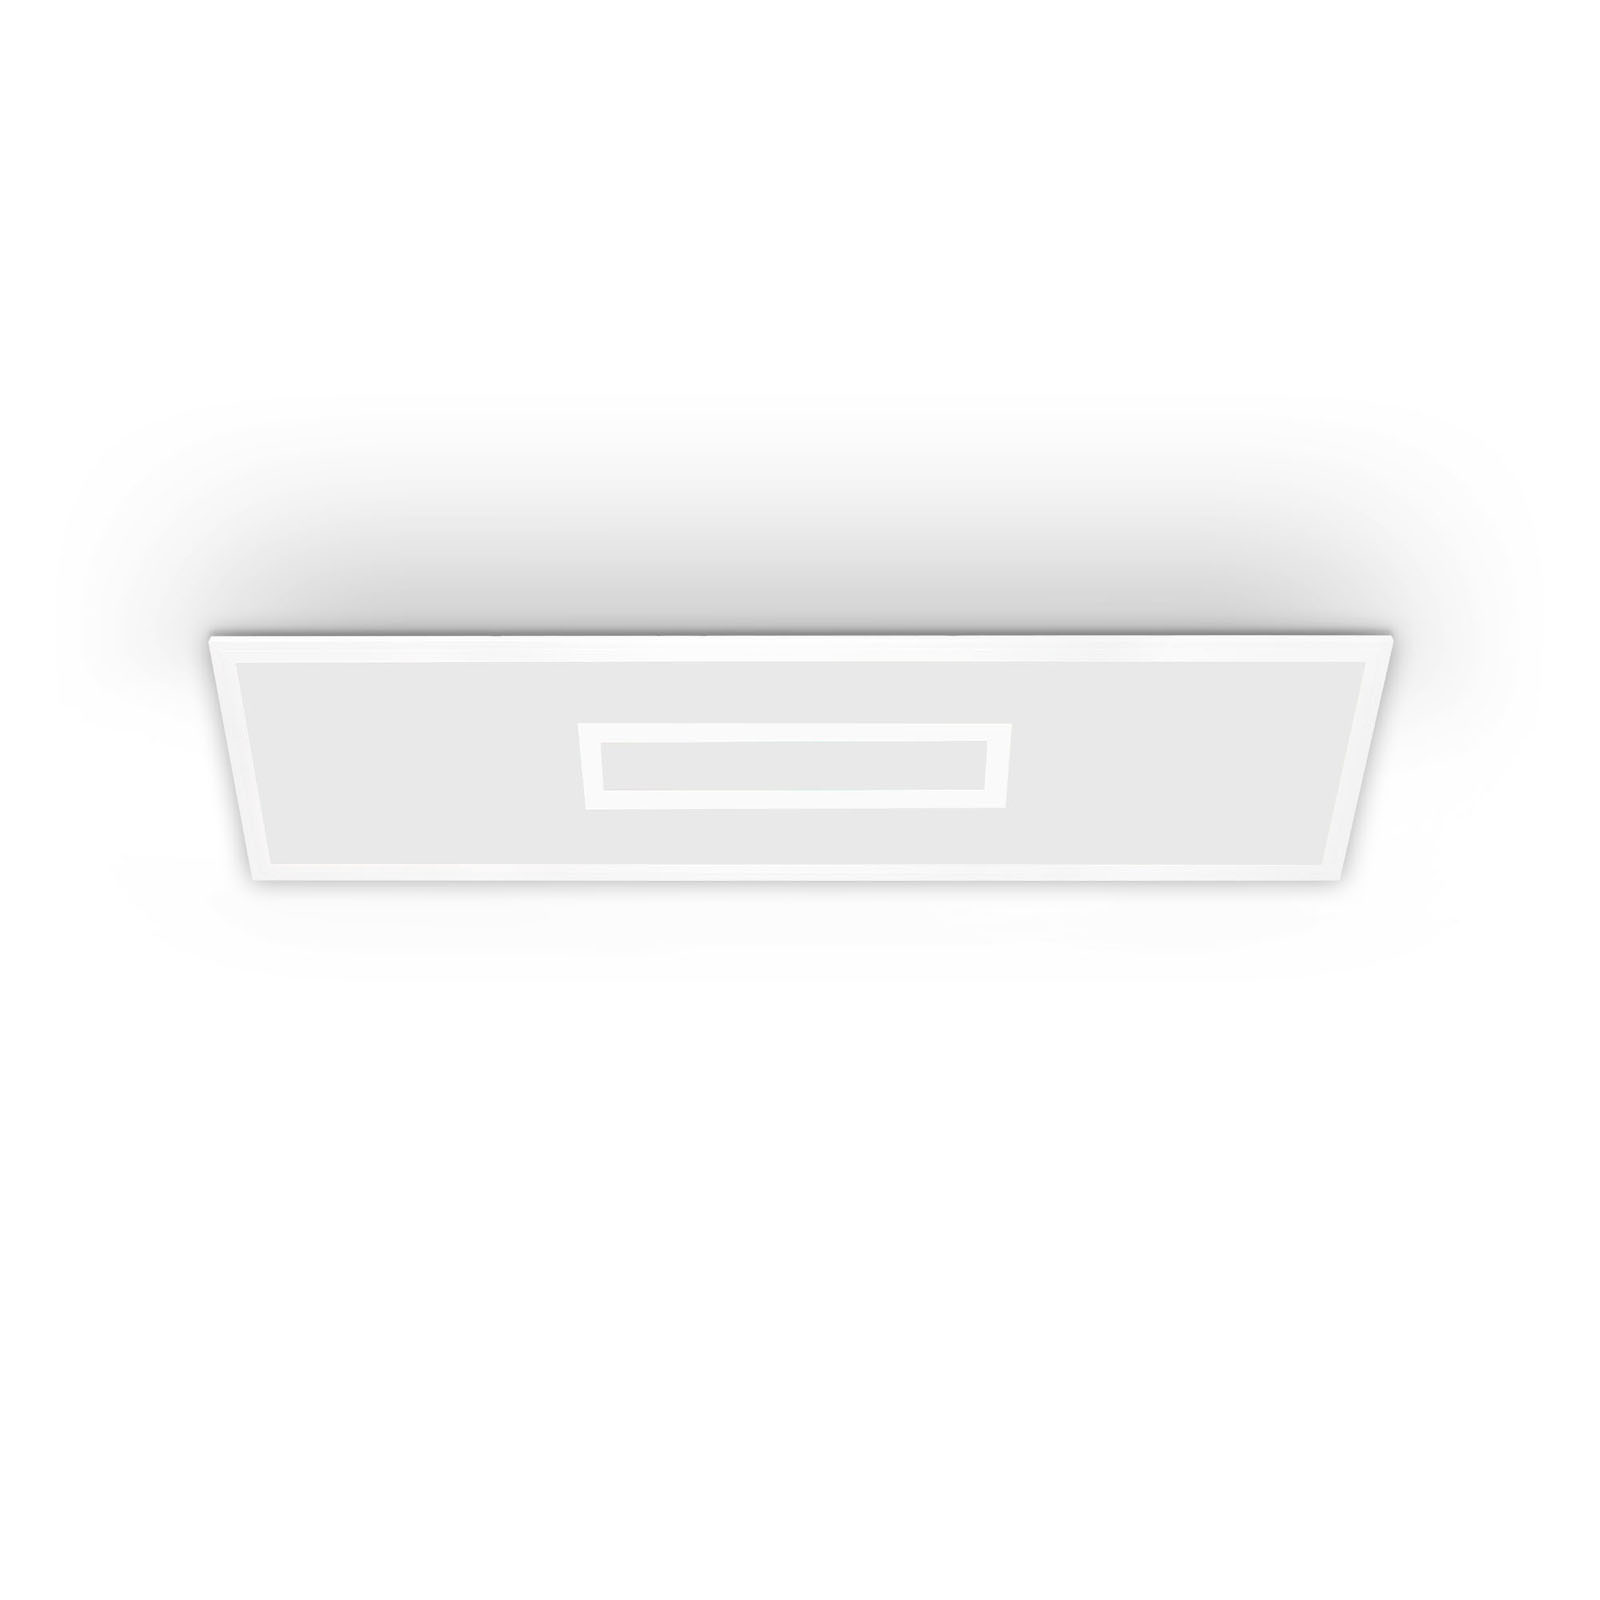 TELEFUNKEN CCT LED Panel, 100 cm, 22 W, Weiß